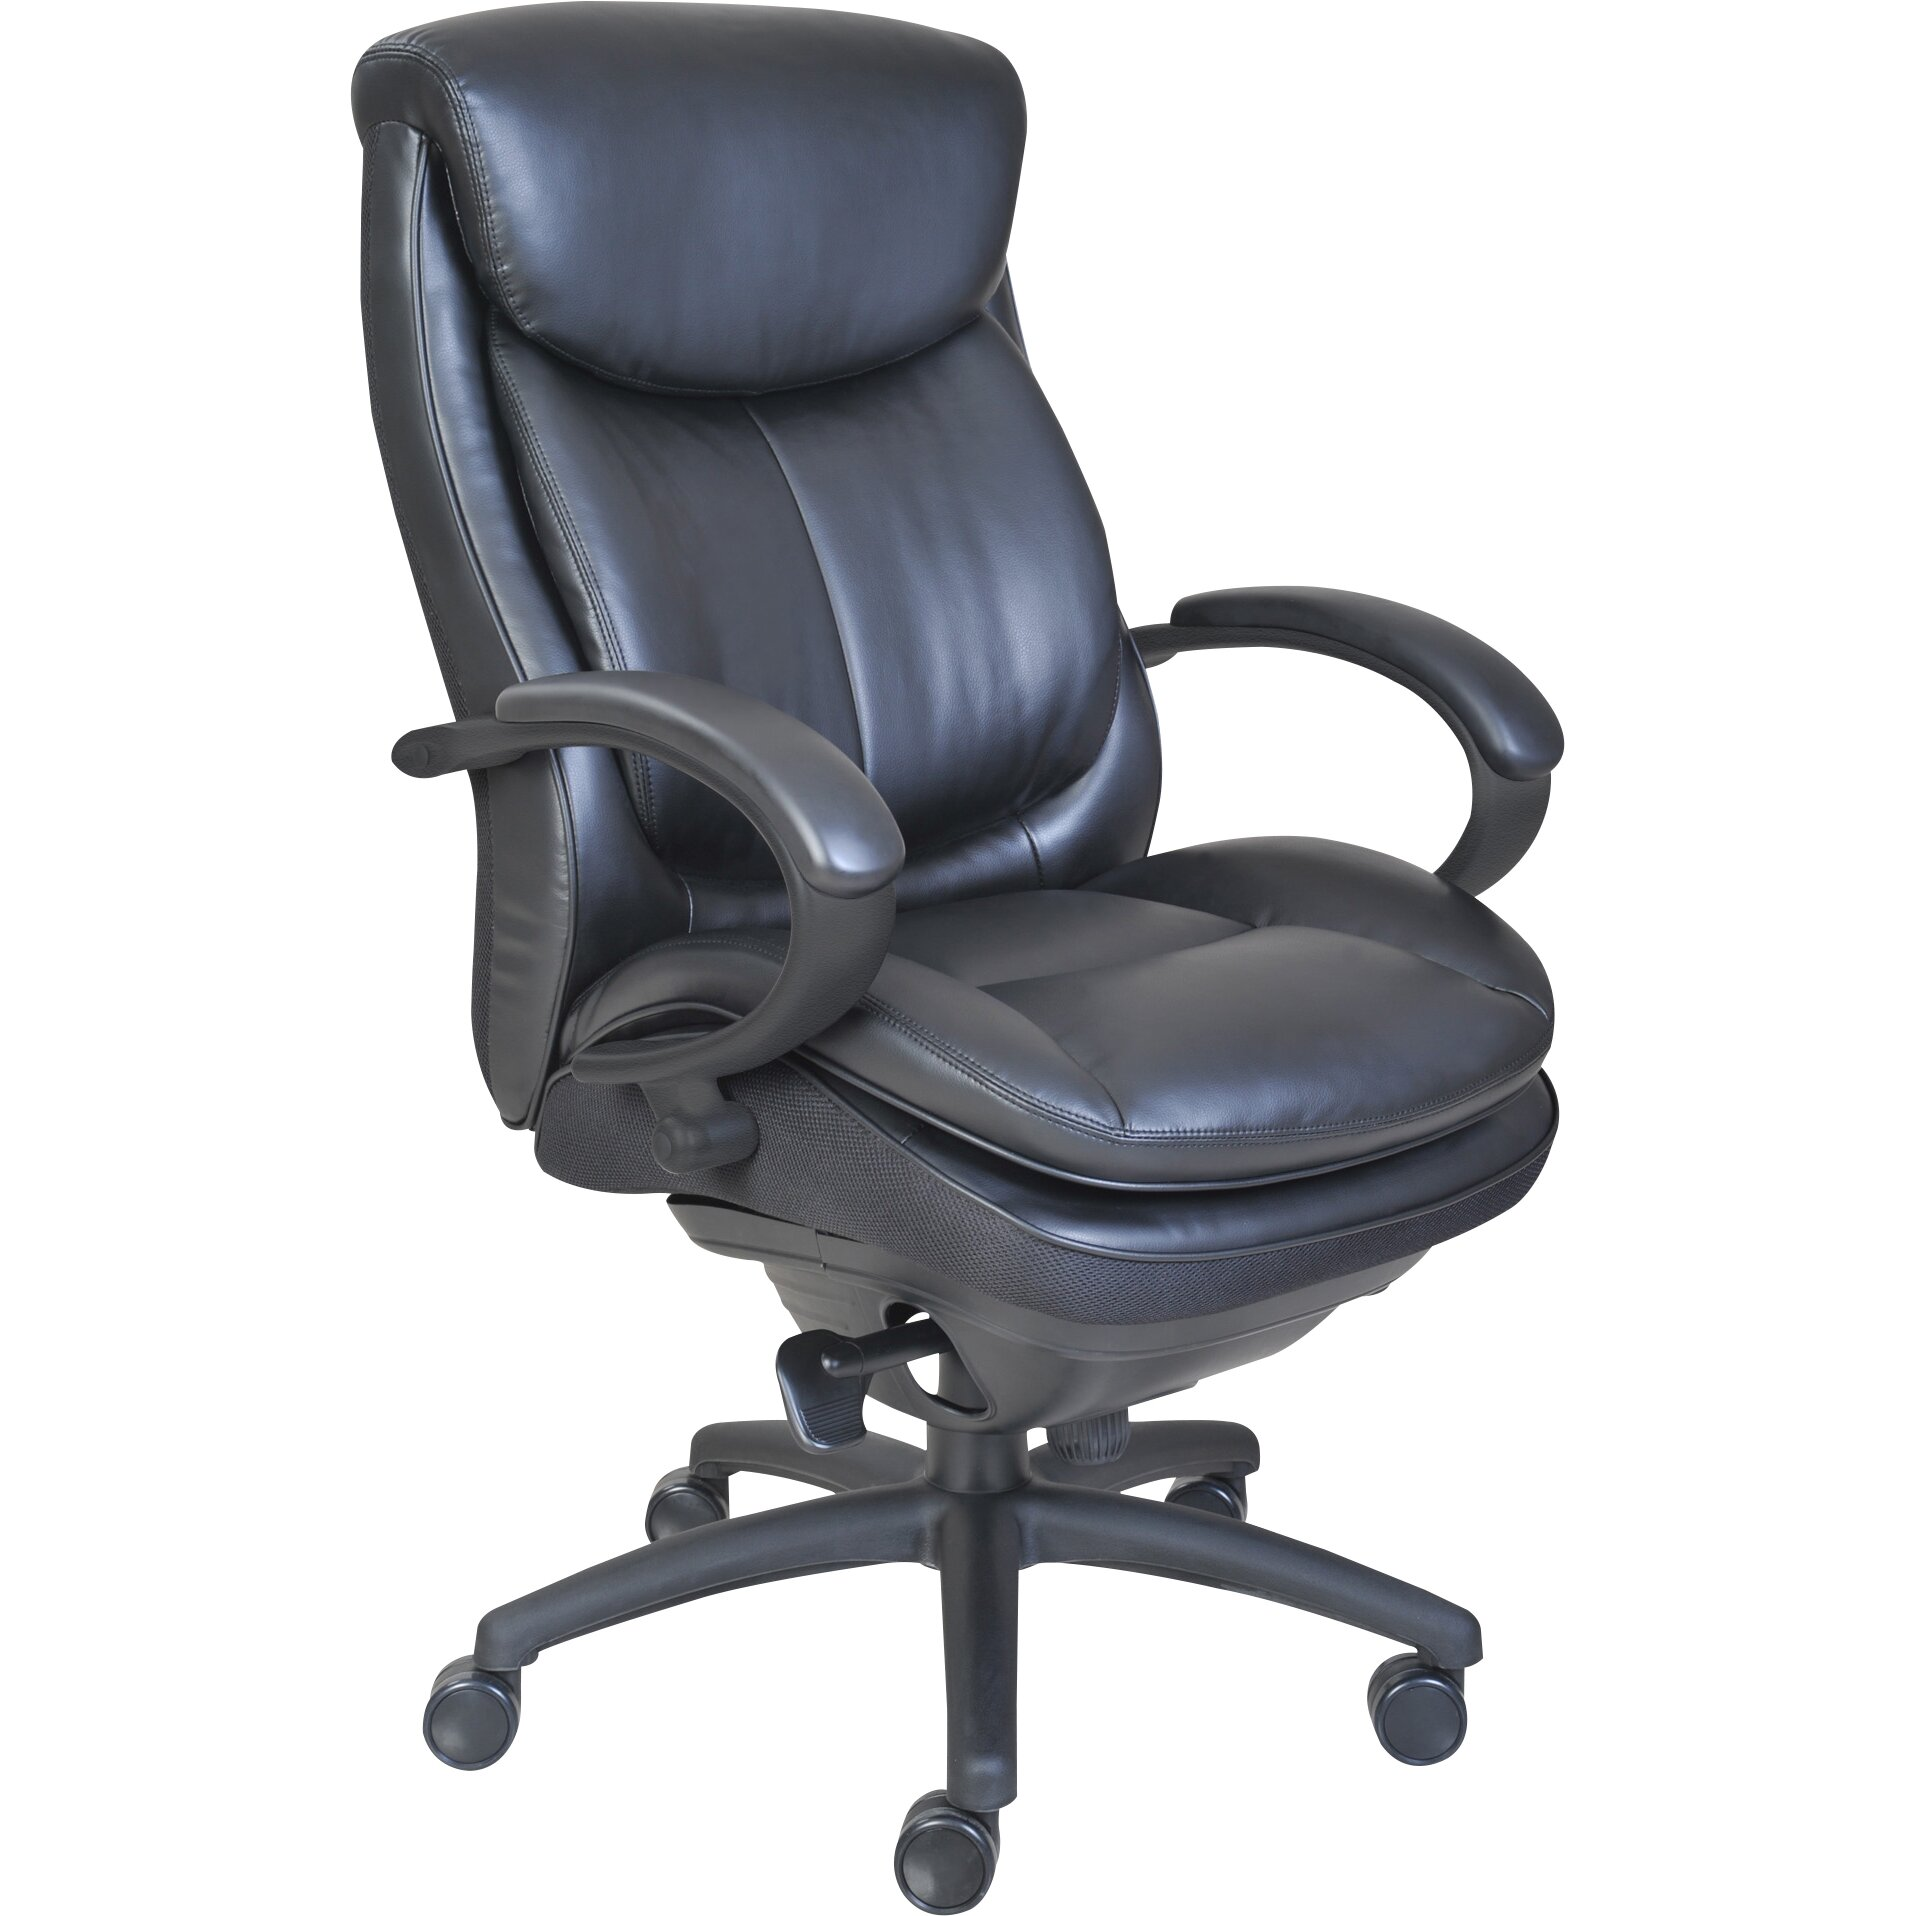 Serta At Home Series High Back Executive Chair Reviews